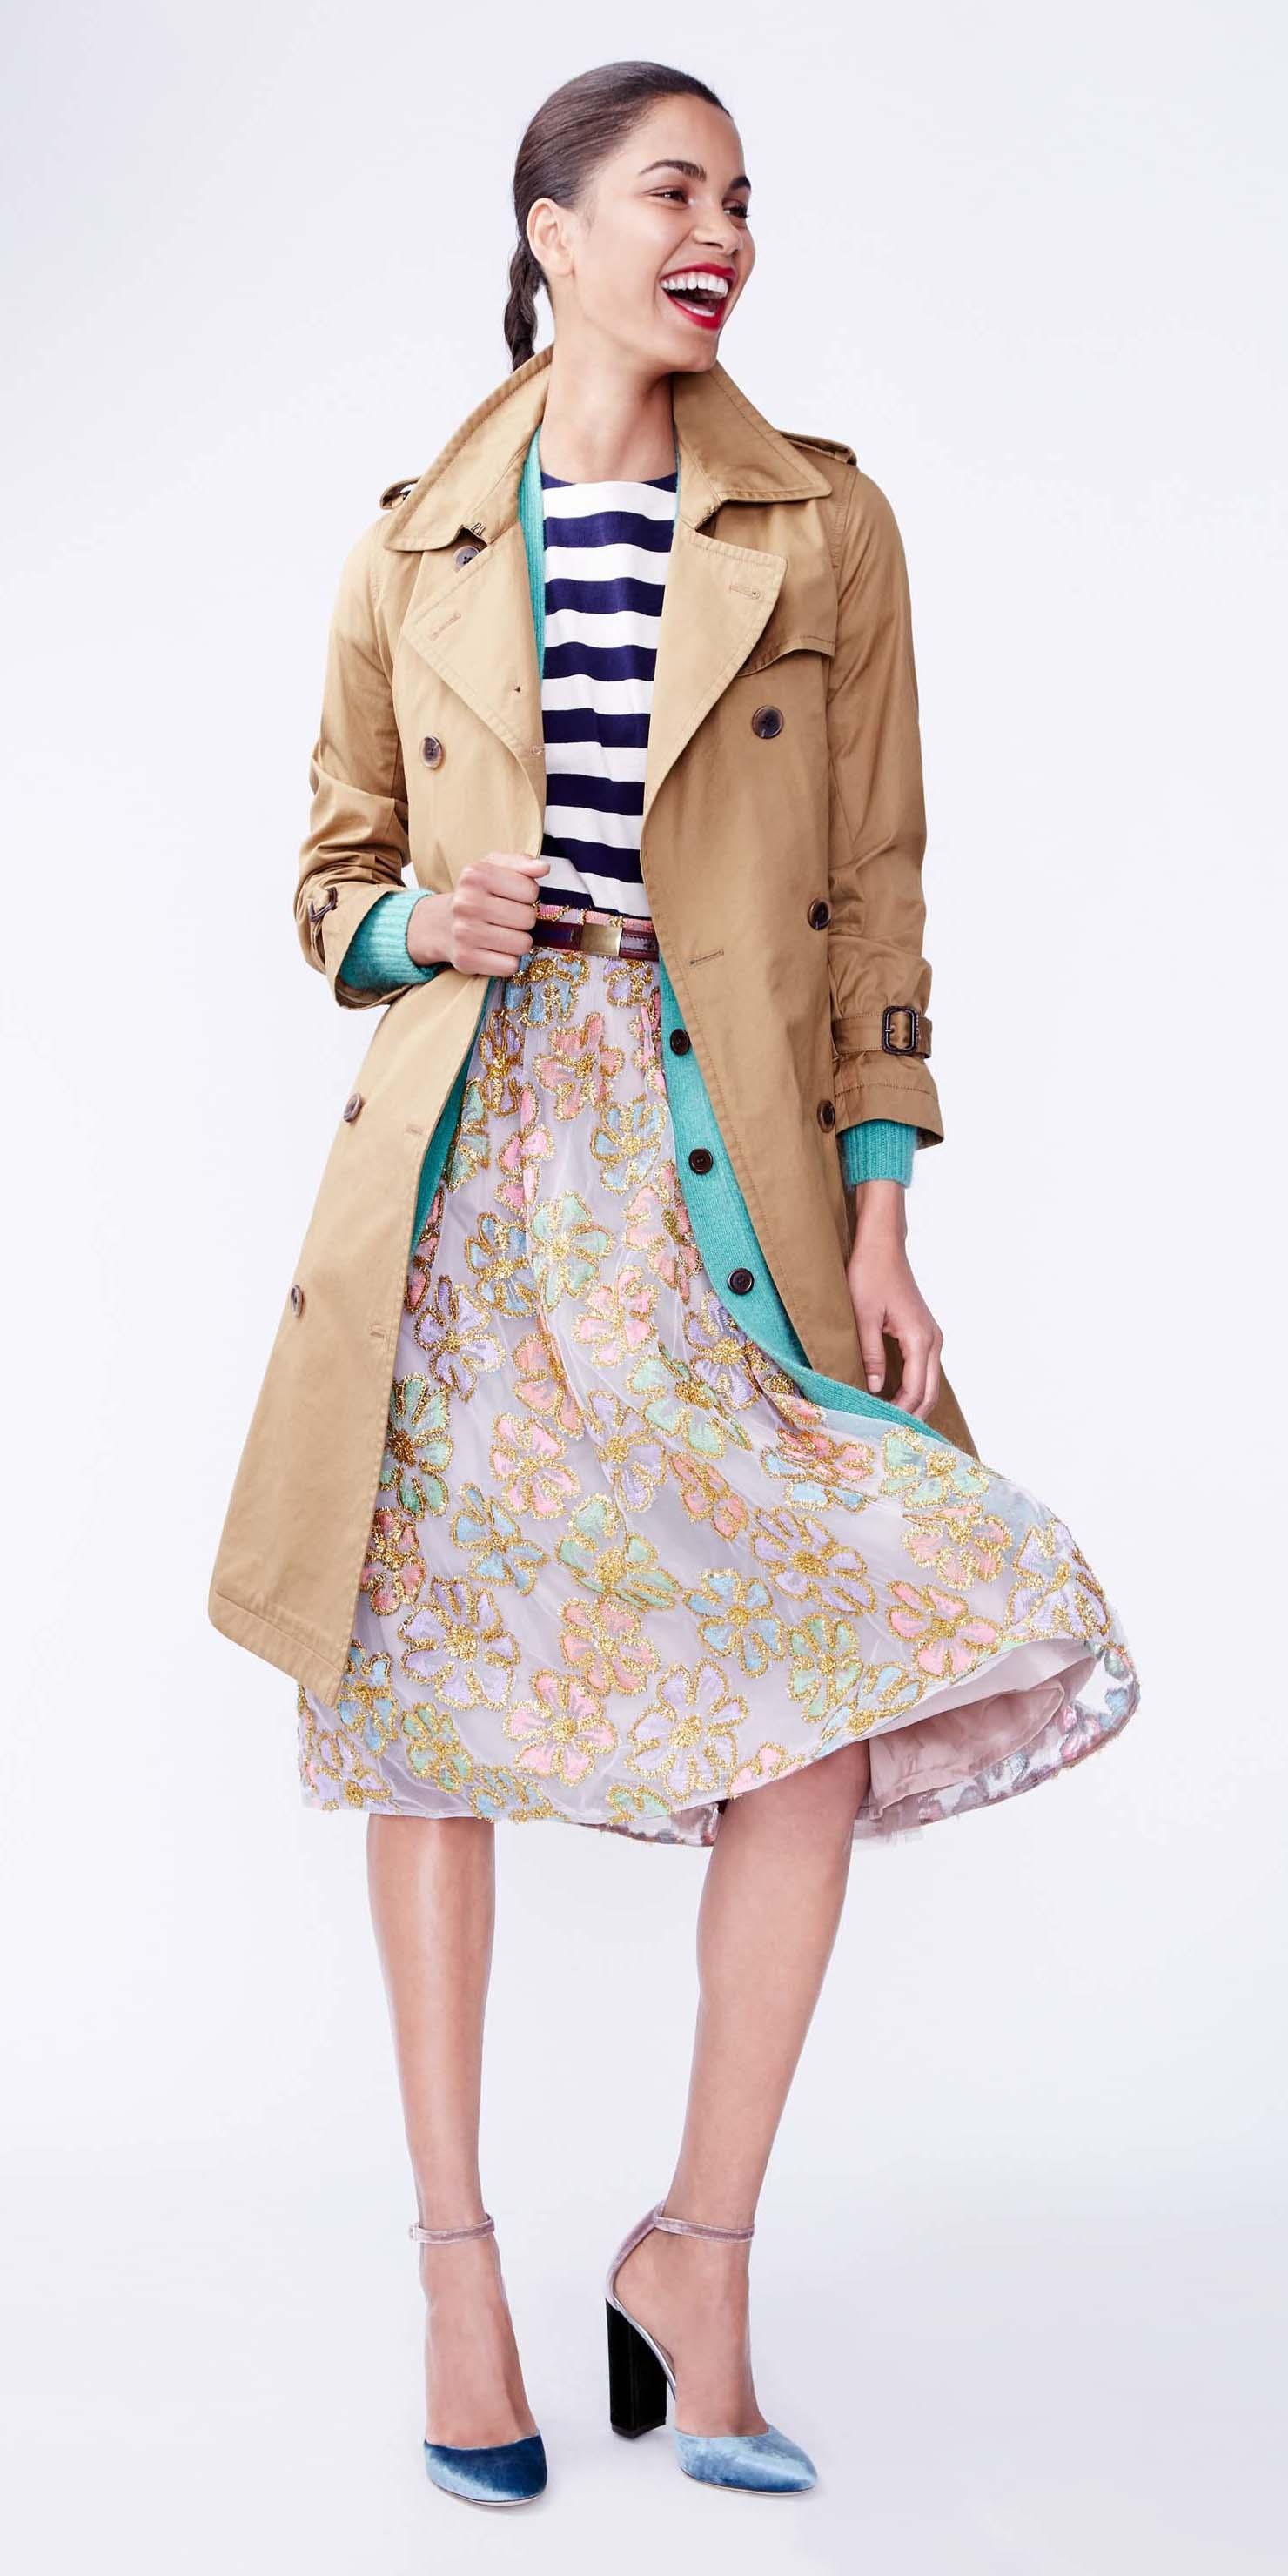 pink-light-aline-skirt-stripe-blue-navy-tee-brun-pony-blue-shoe-pumps-tan-jacket-coat-trench-fall-winter-lunch.jpg